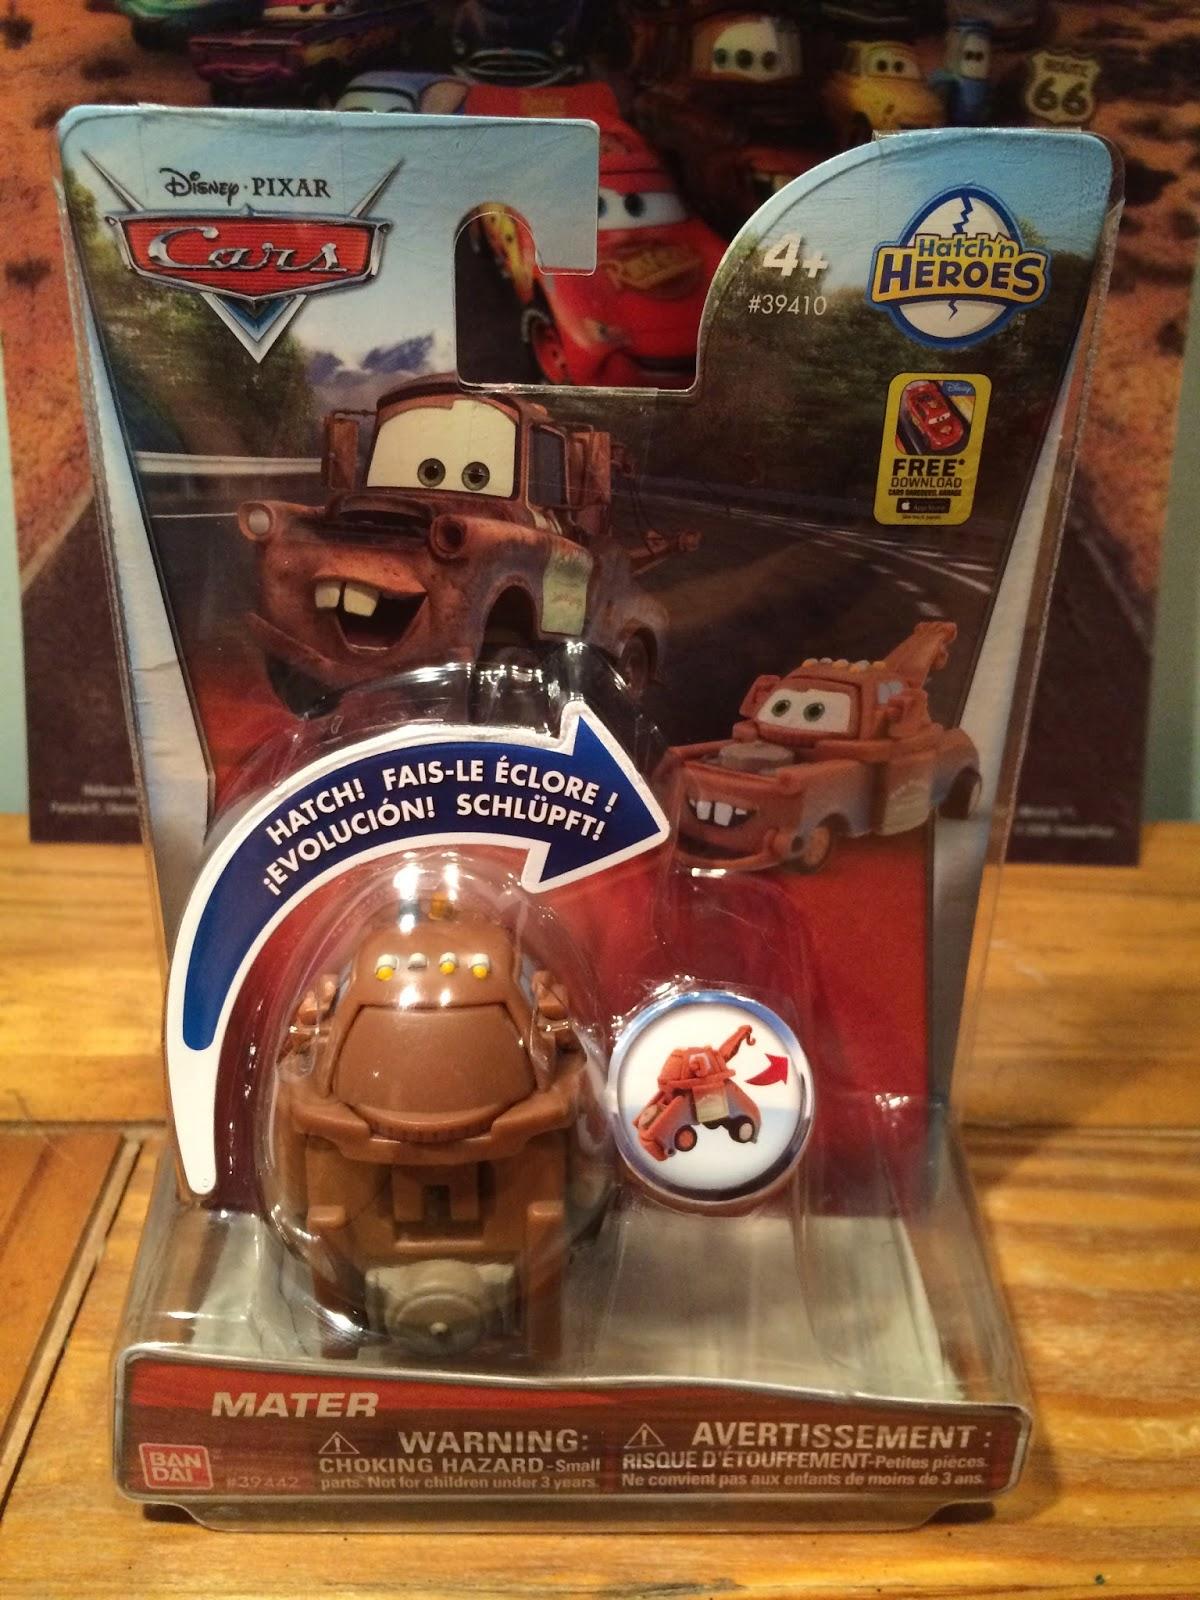 Dan The Pixar Fan Cars Hatch N Heroes Part 1 Lightning Mcqueen